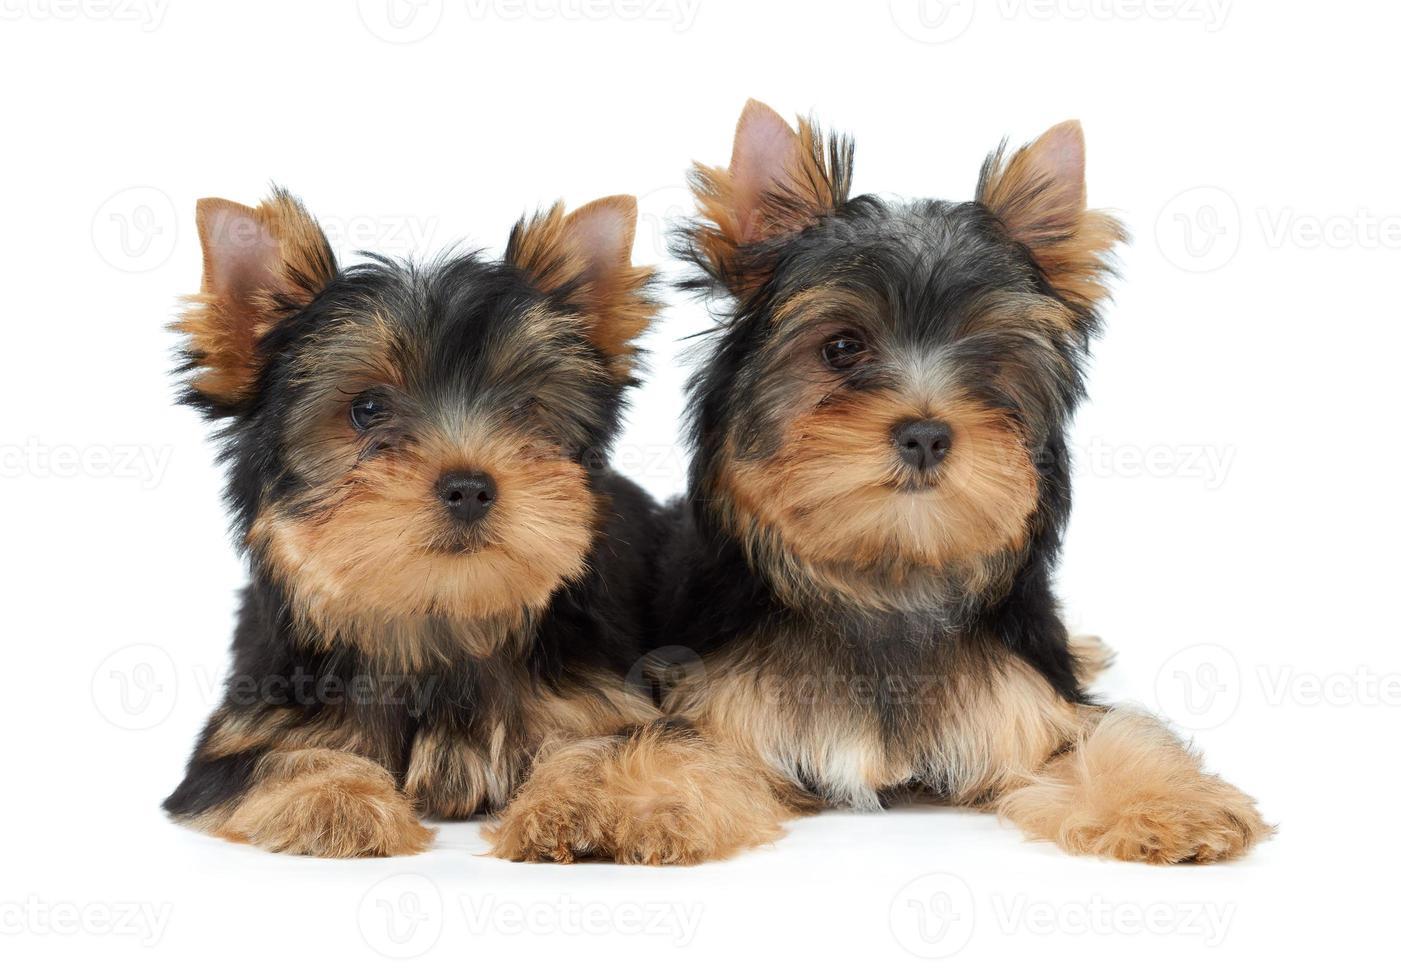 Two small pets photo